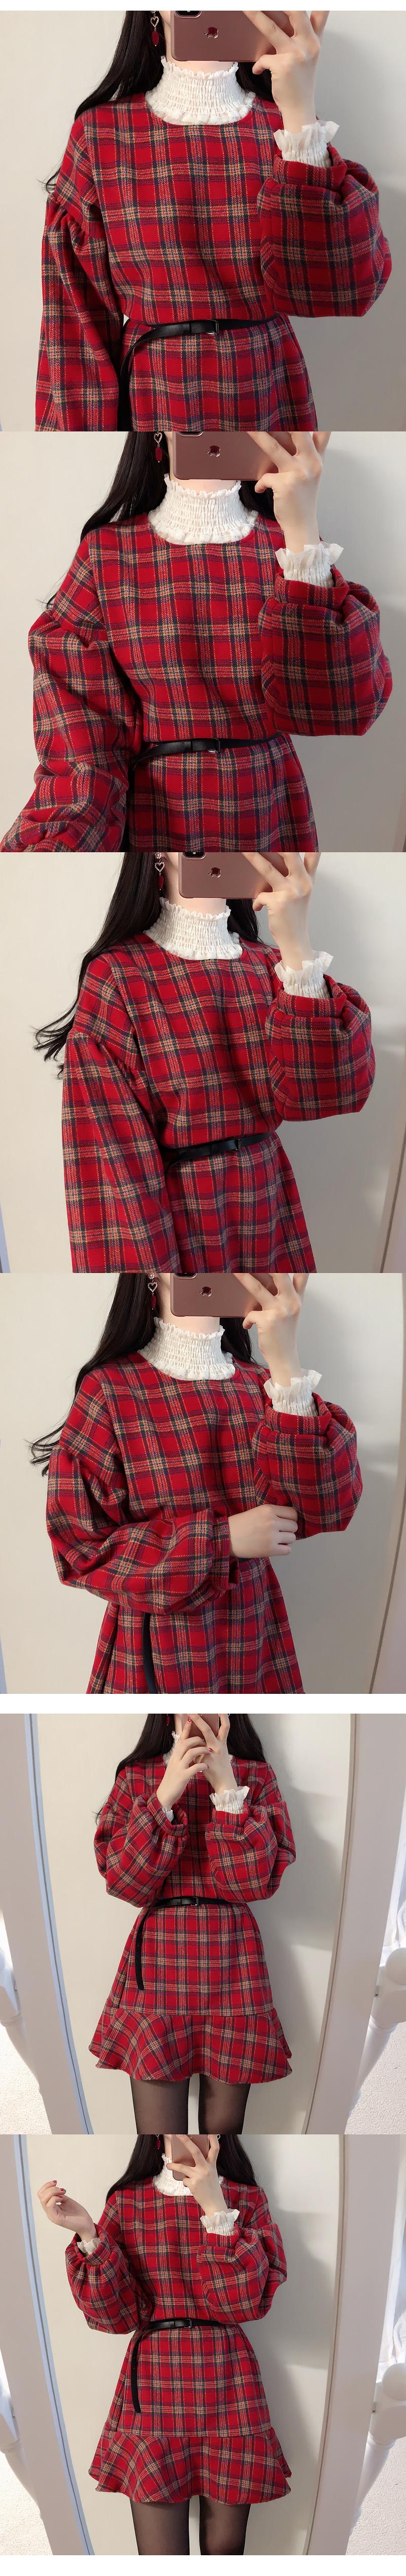 Self-manufactured ♥ belt set or check mini ops